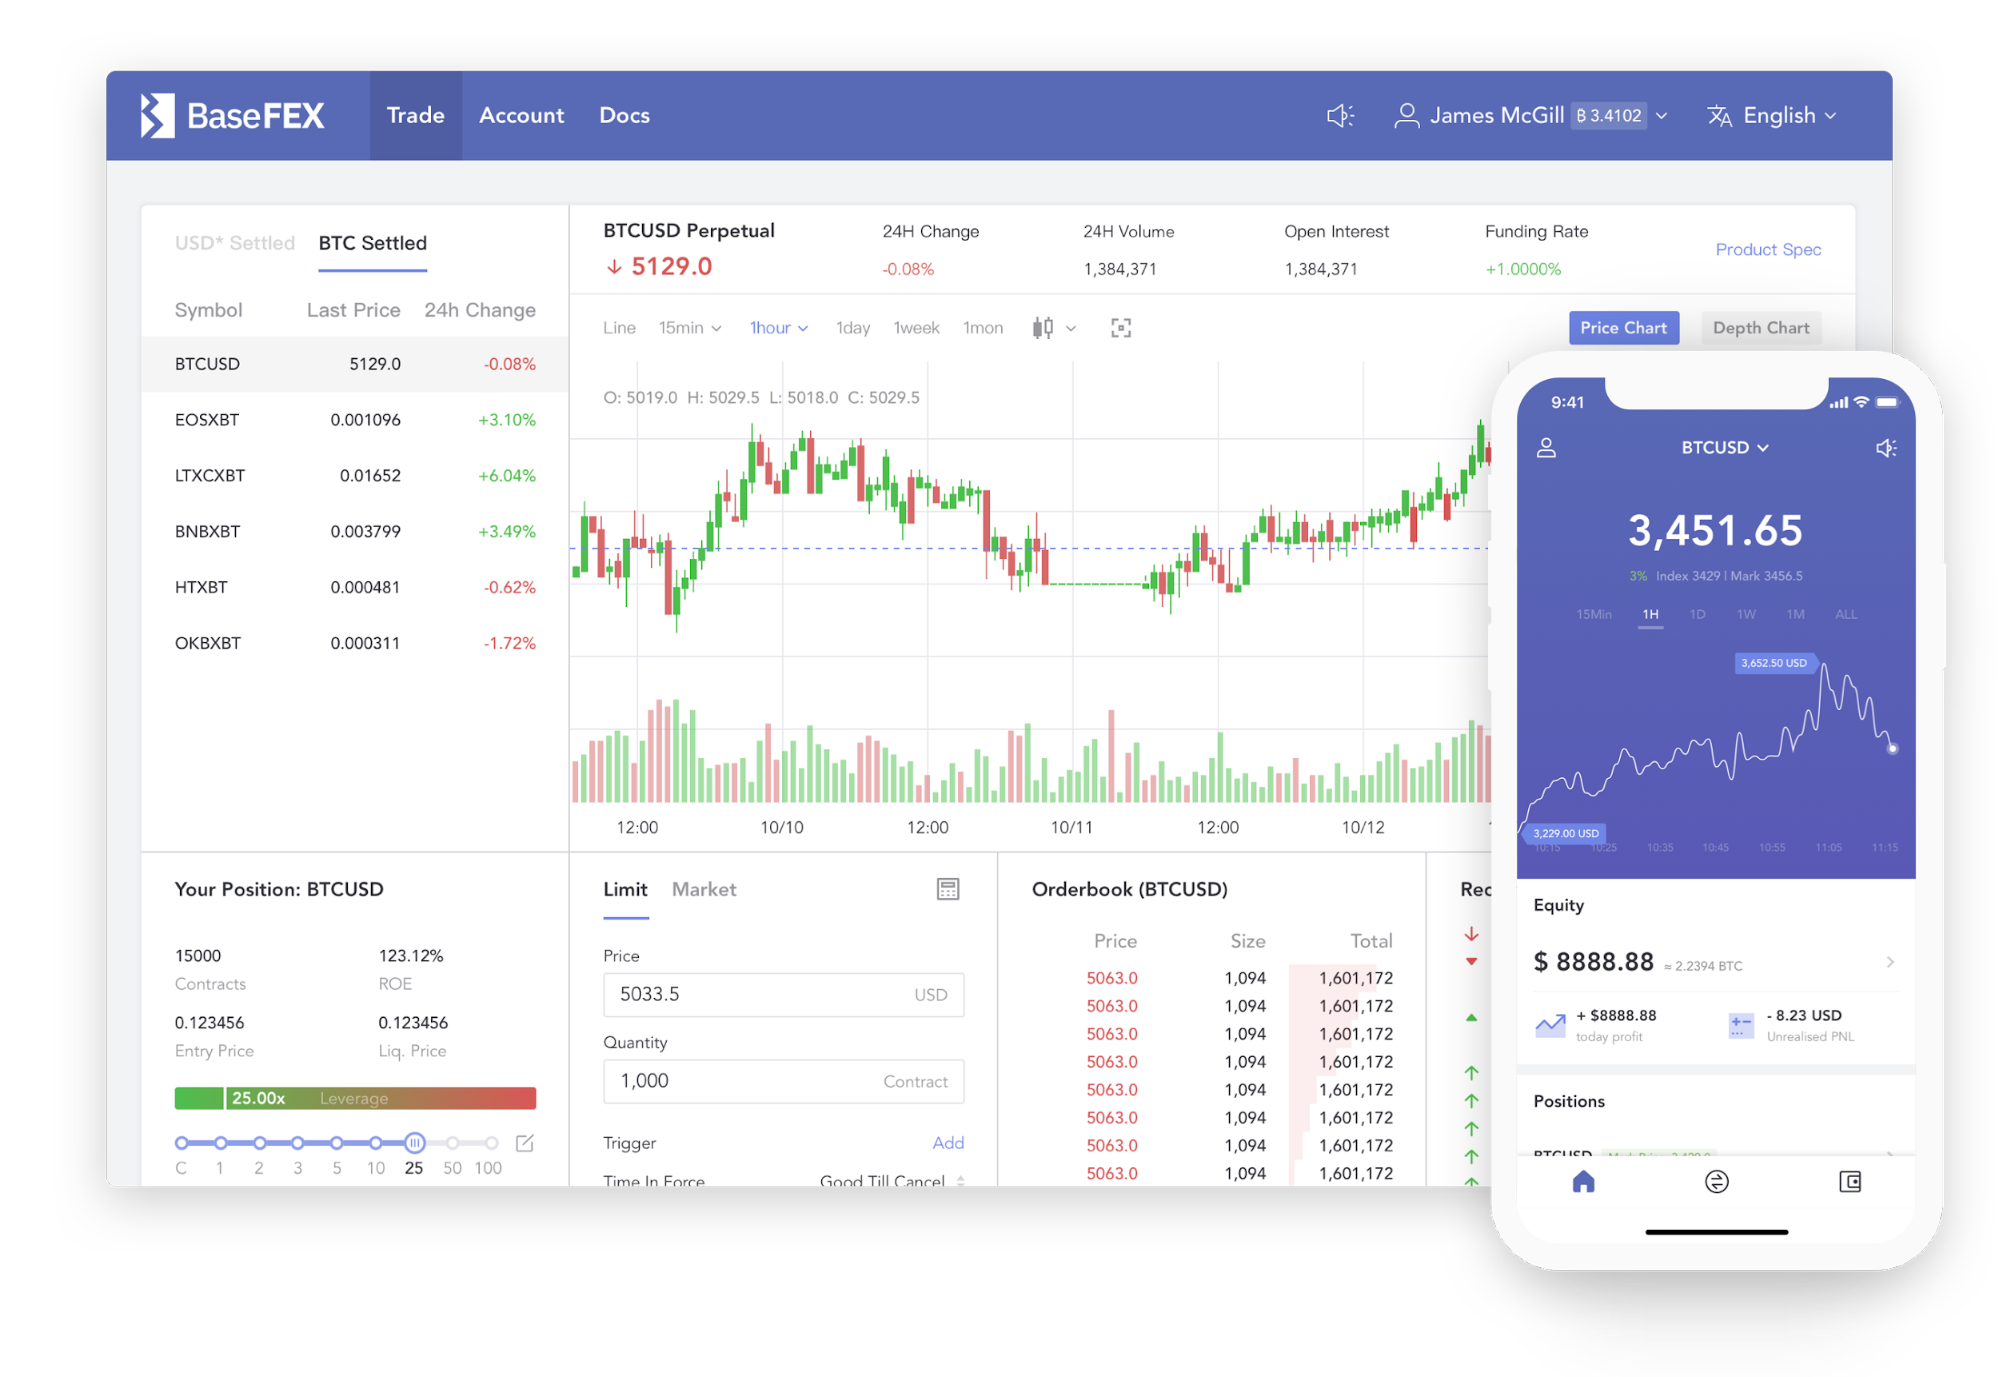 BaseFEX trading platform